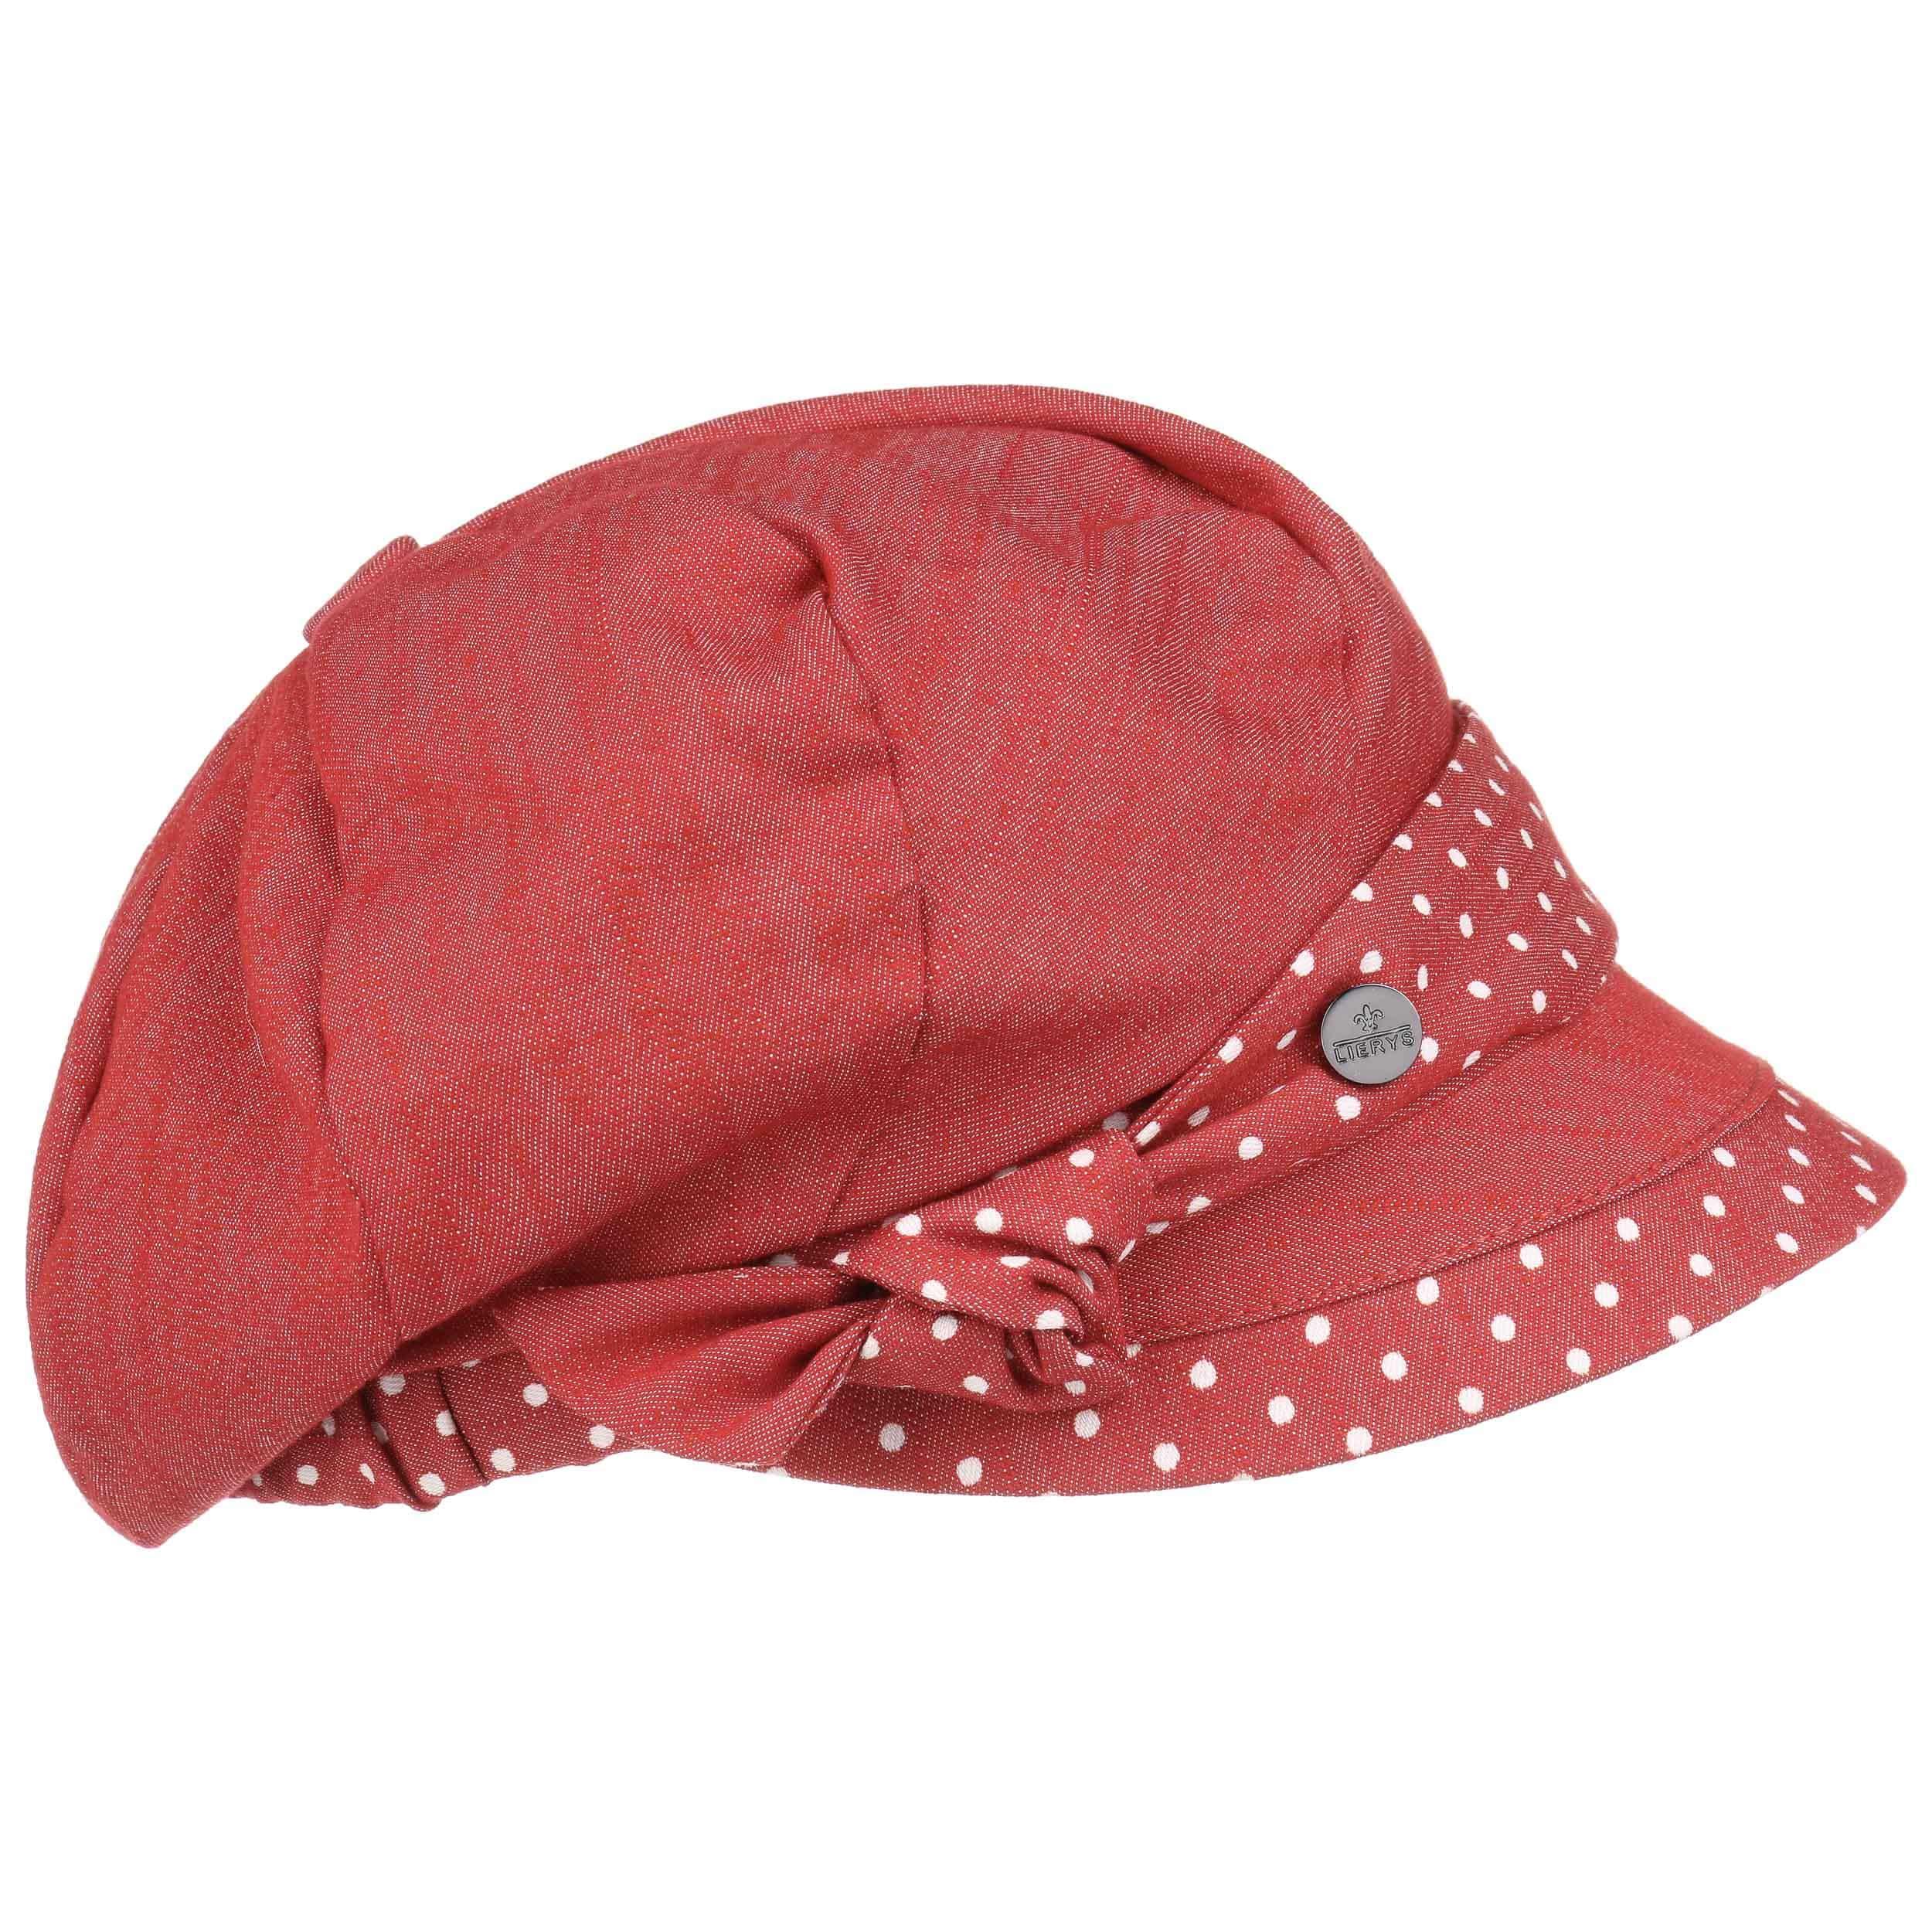 Gorra Newsboy Mila Dotted Peak by Lierys - Gorras - sombreroshop.es 7e0054edb1a